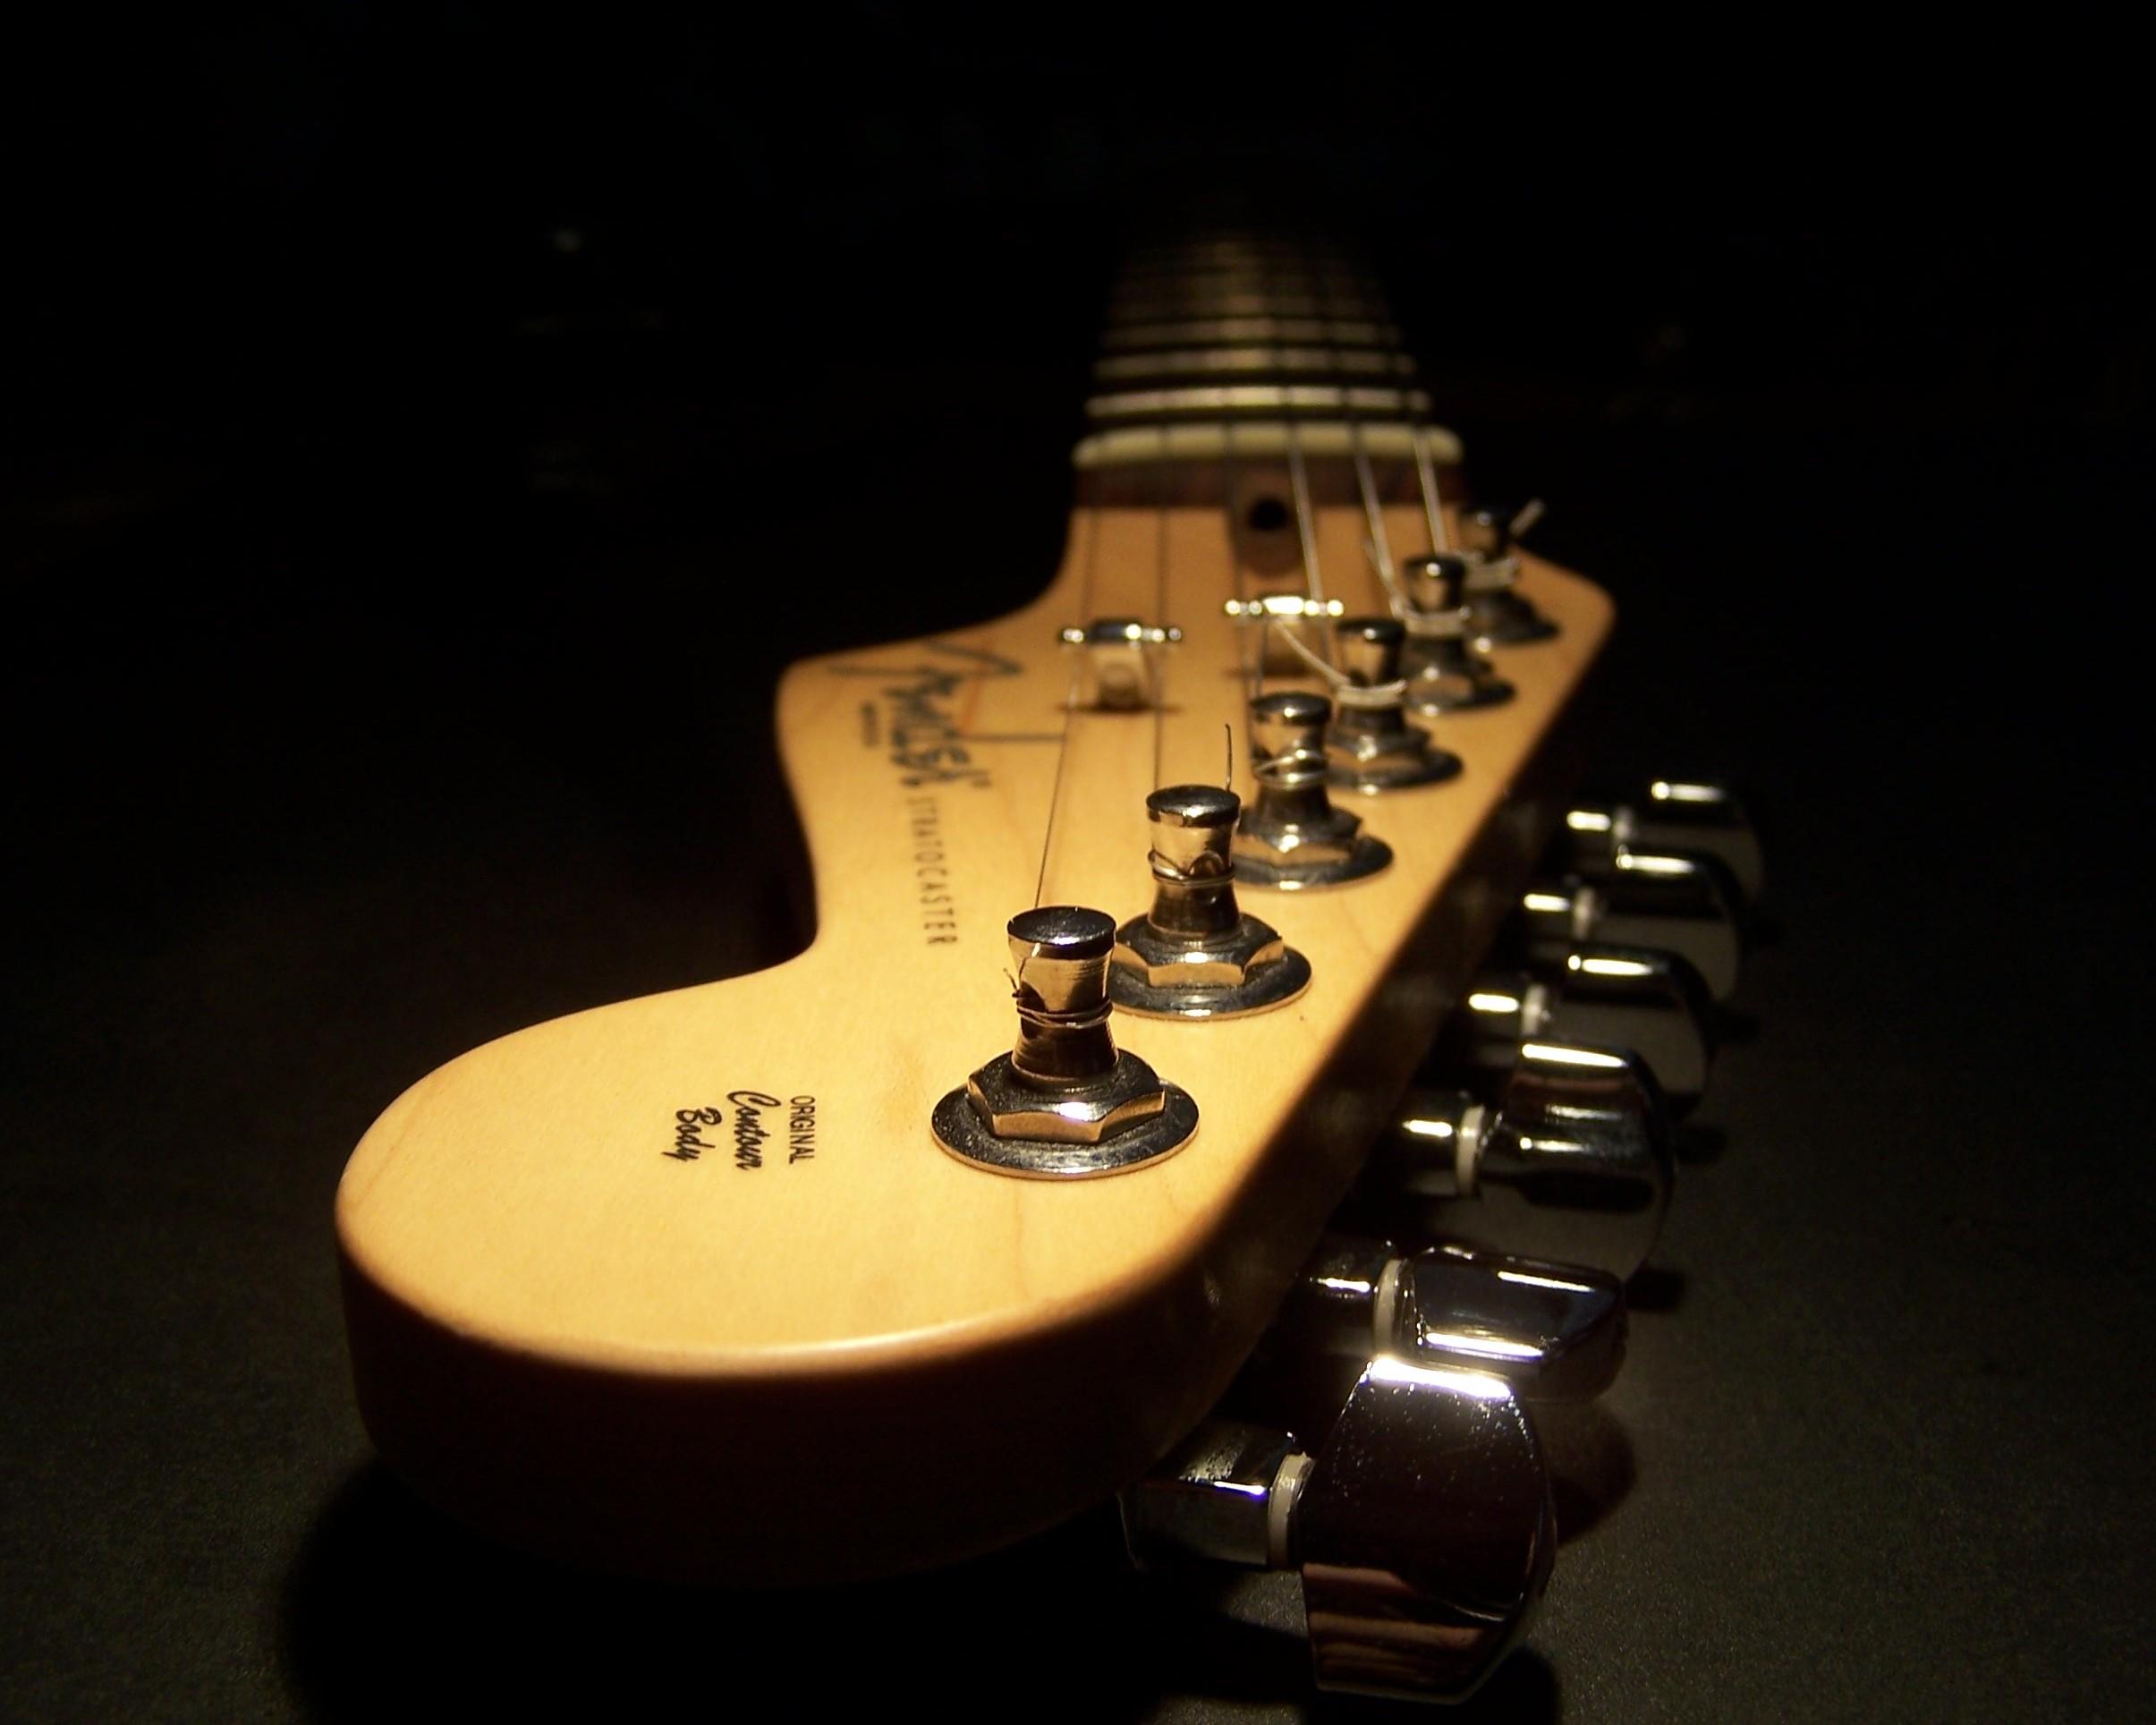 Hd wallpaper guitar - Hd Wallpaper Background Id 246462 2410x1928 Music Guitar